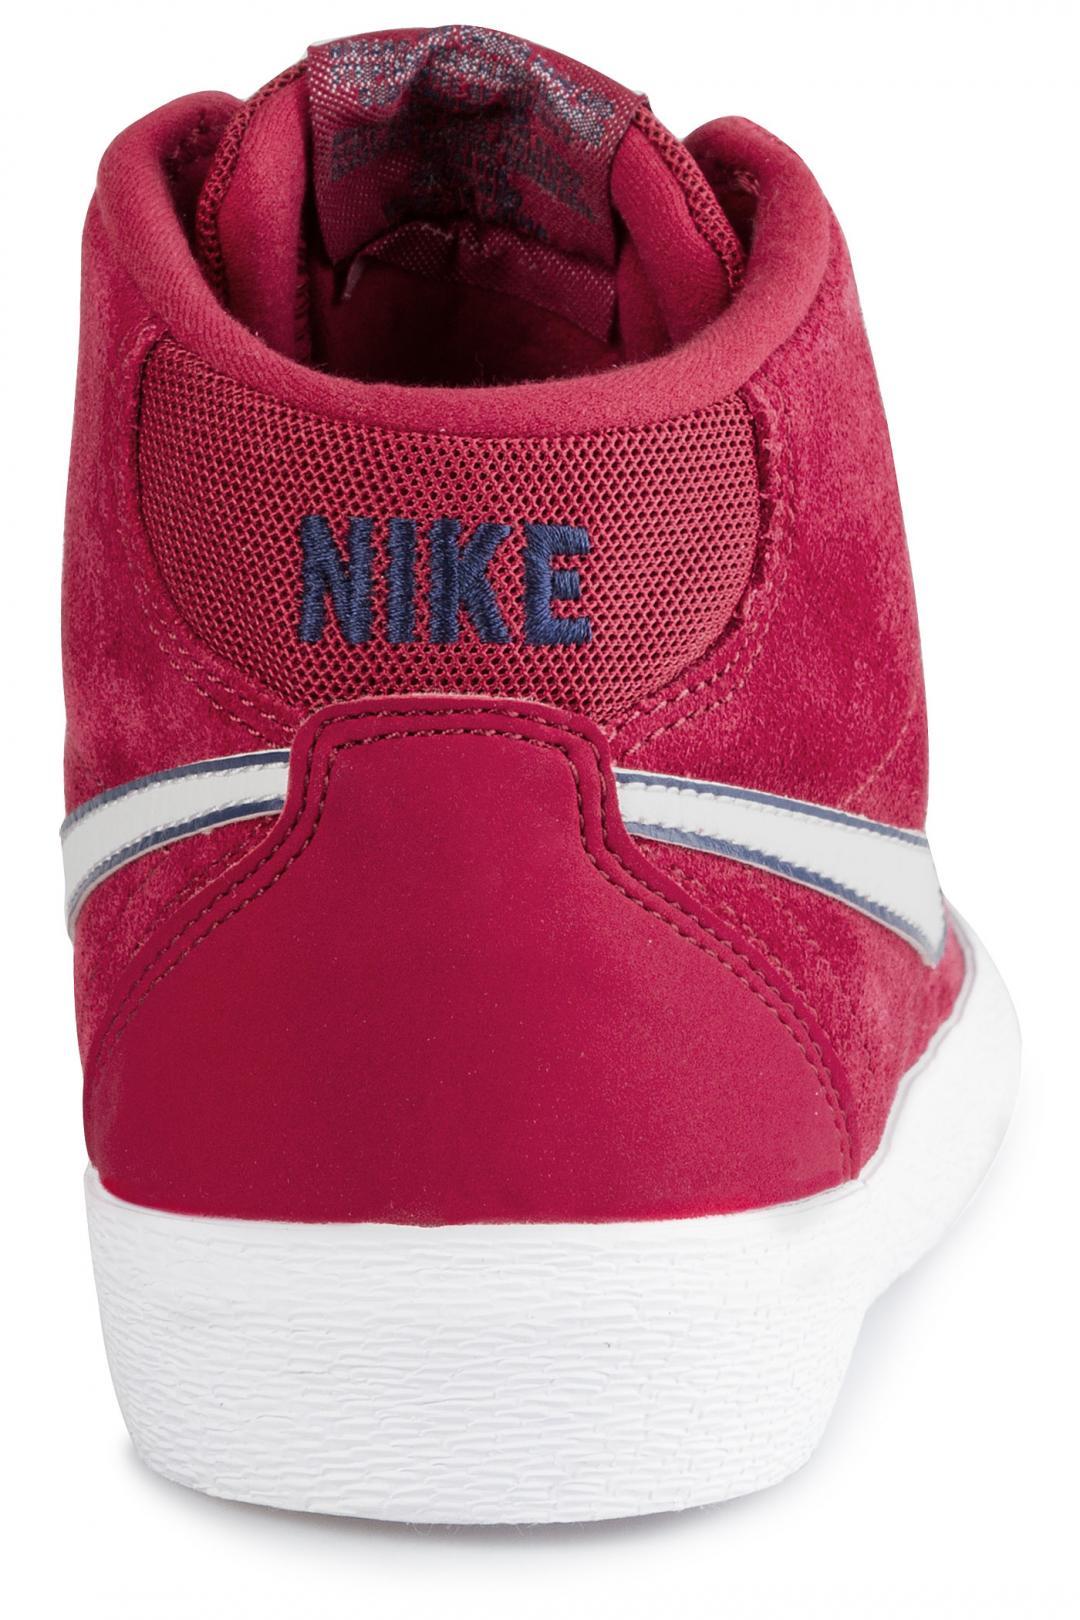 Donna Nike SB Bruin Hi red crush white   Sneaker